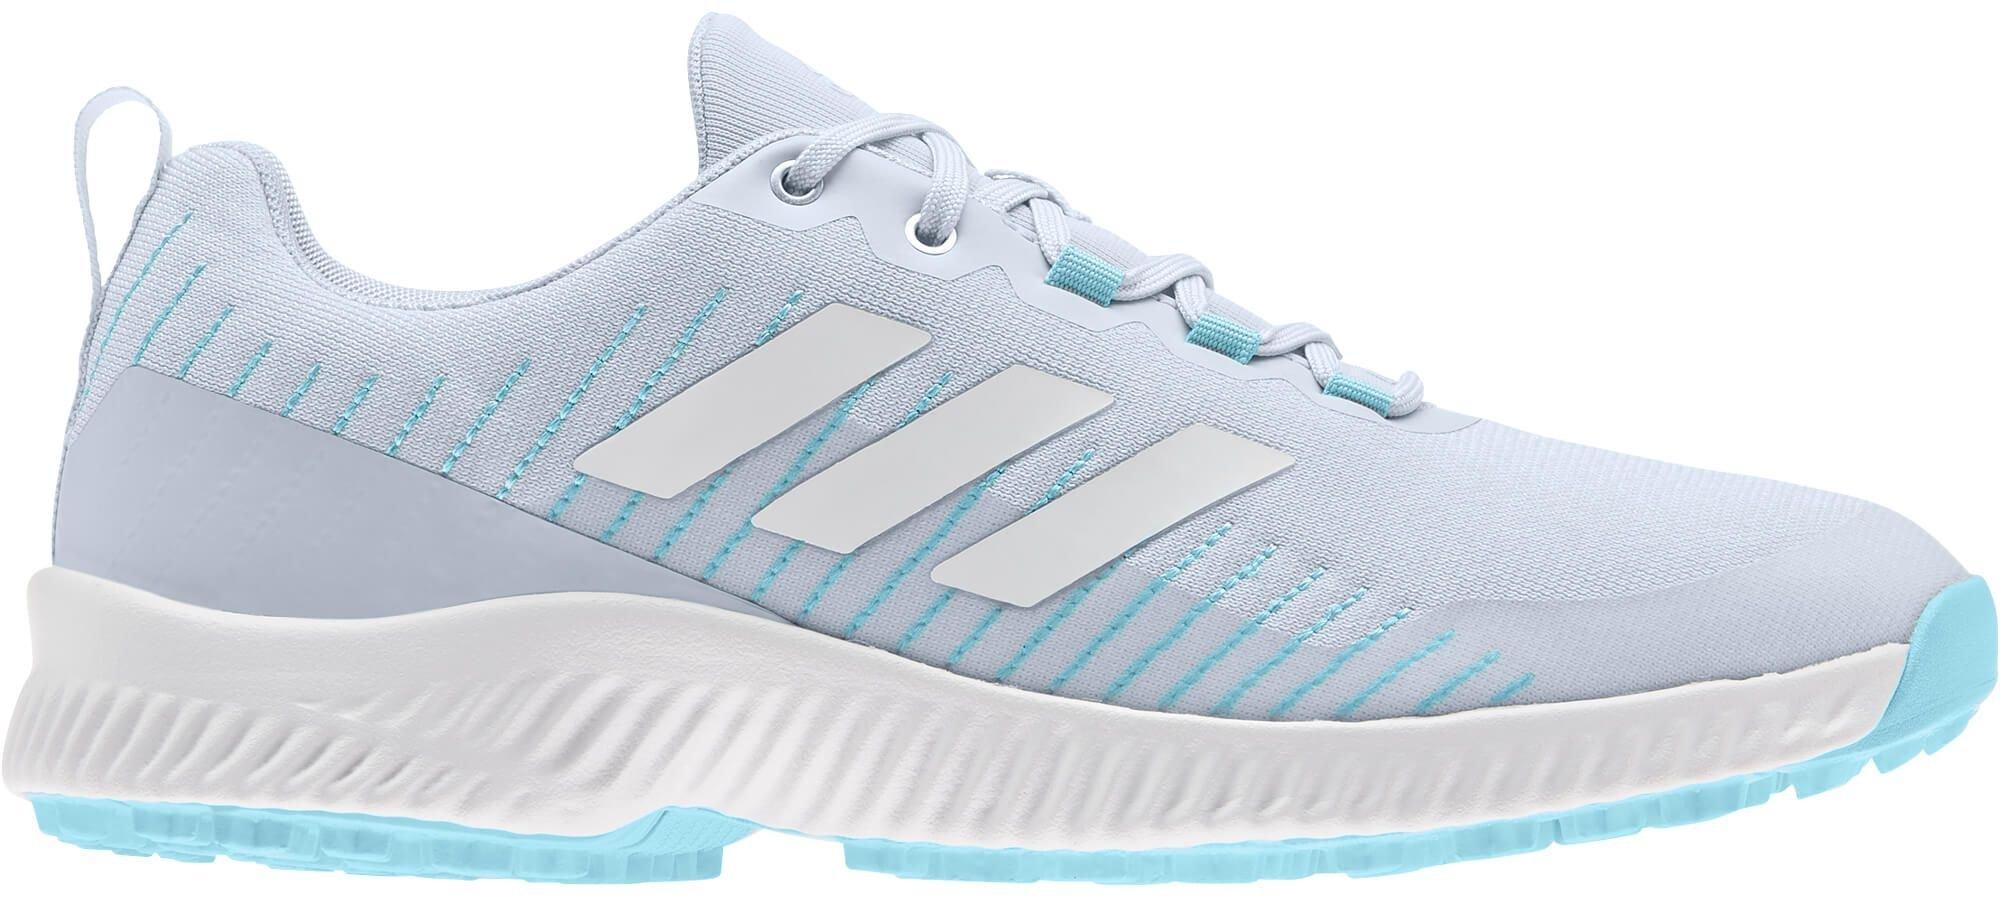 adidas Womens Response Bounce 2.0 SL Golf Shoes 2021 - Blue/White/Sky